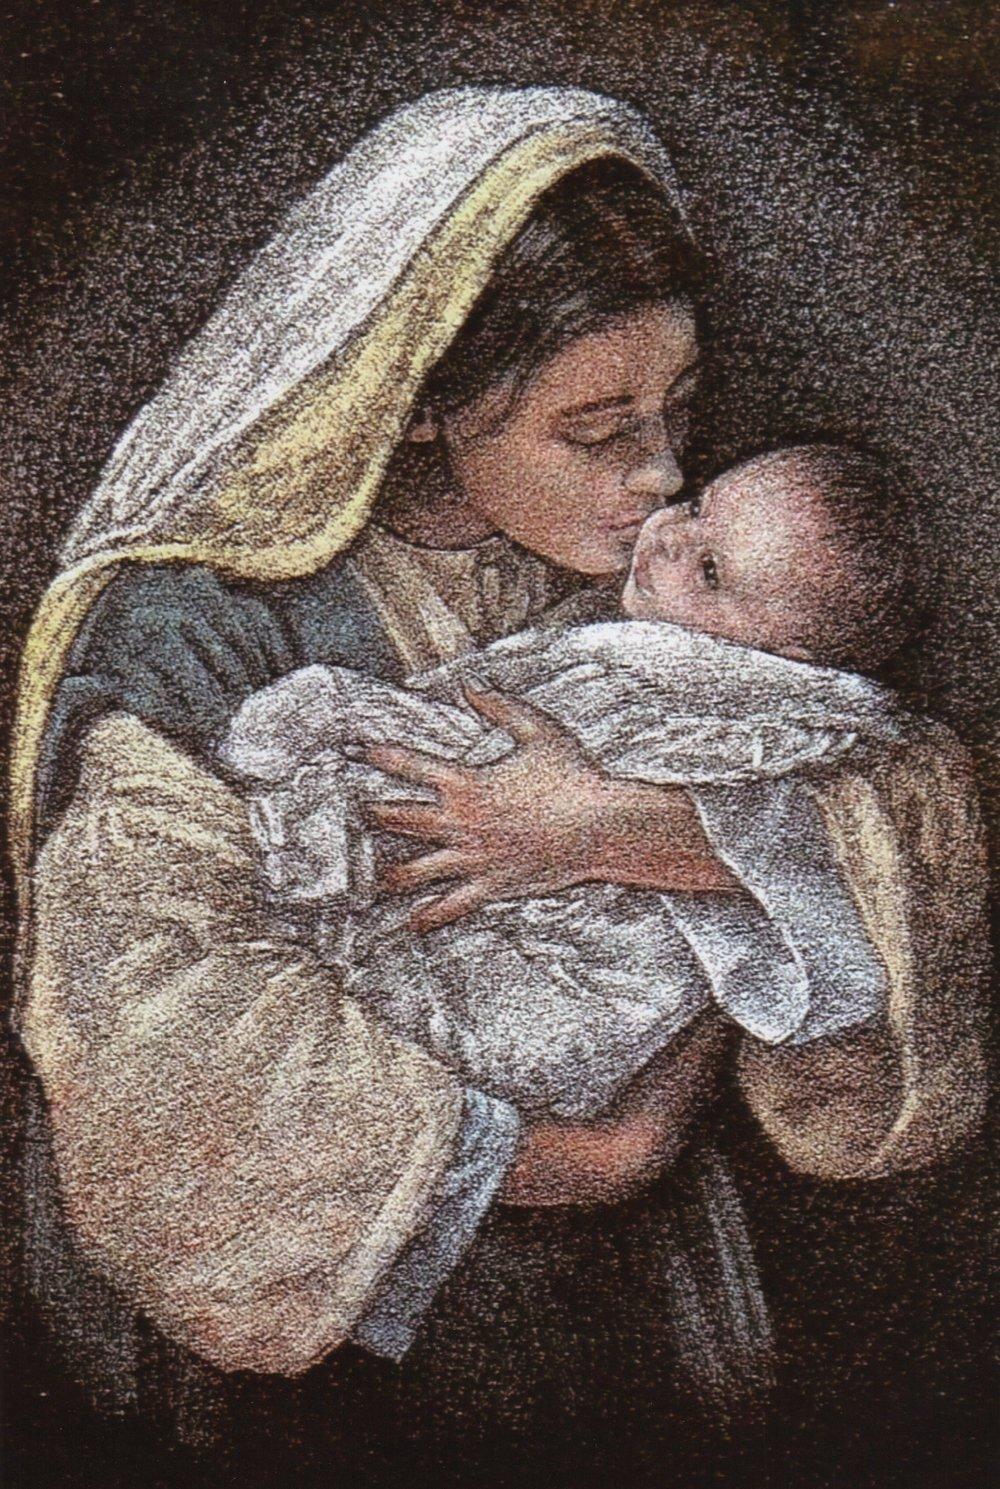 Madonna and child_0001.jpg